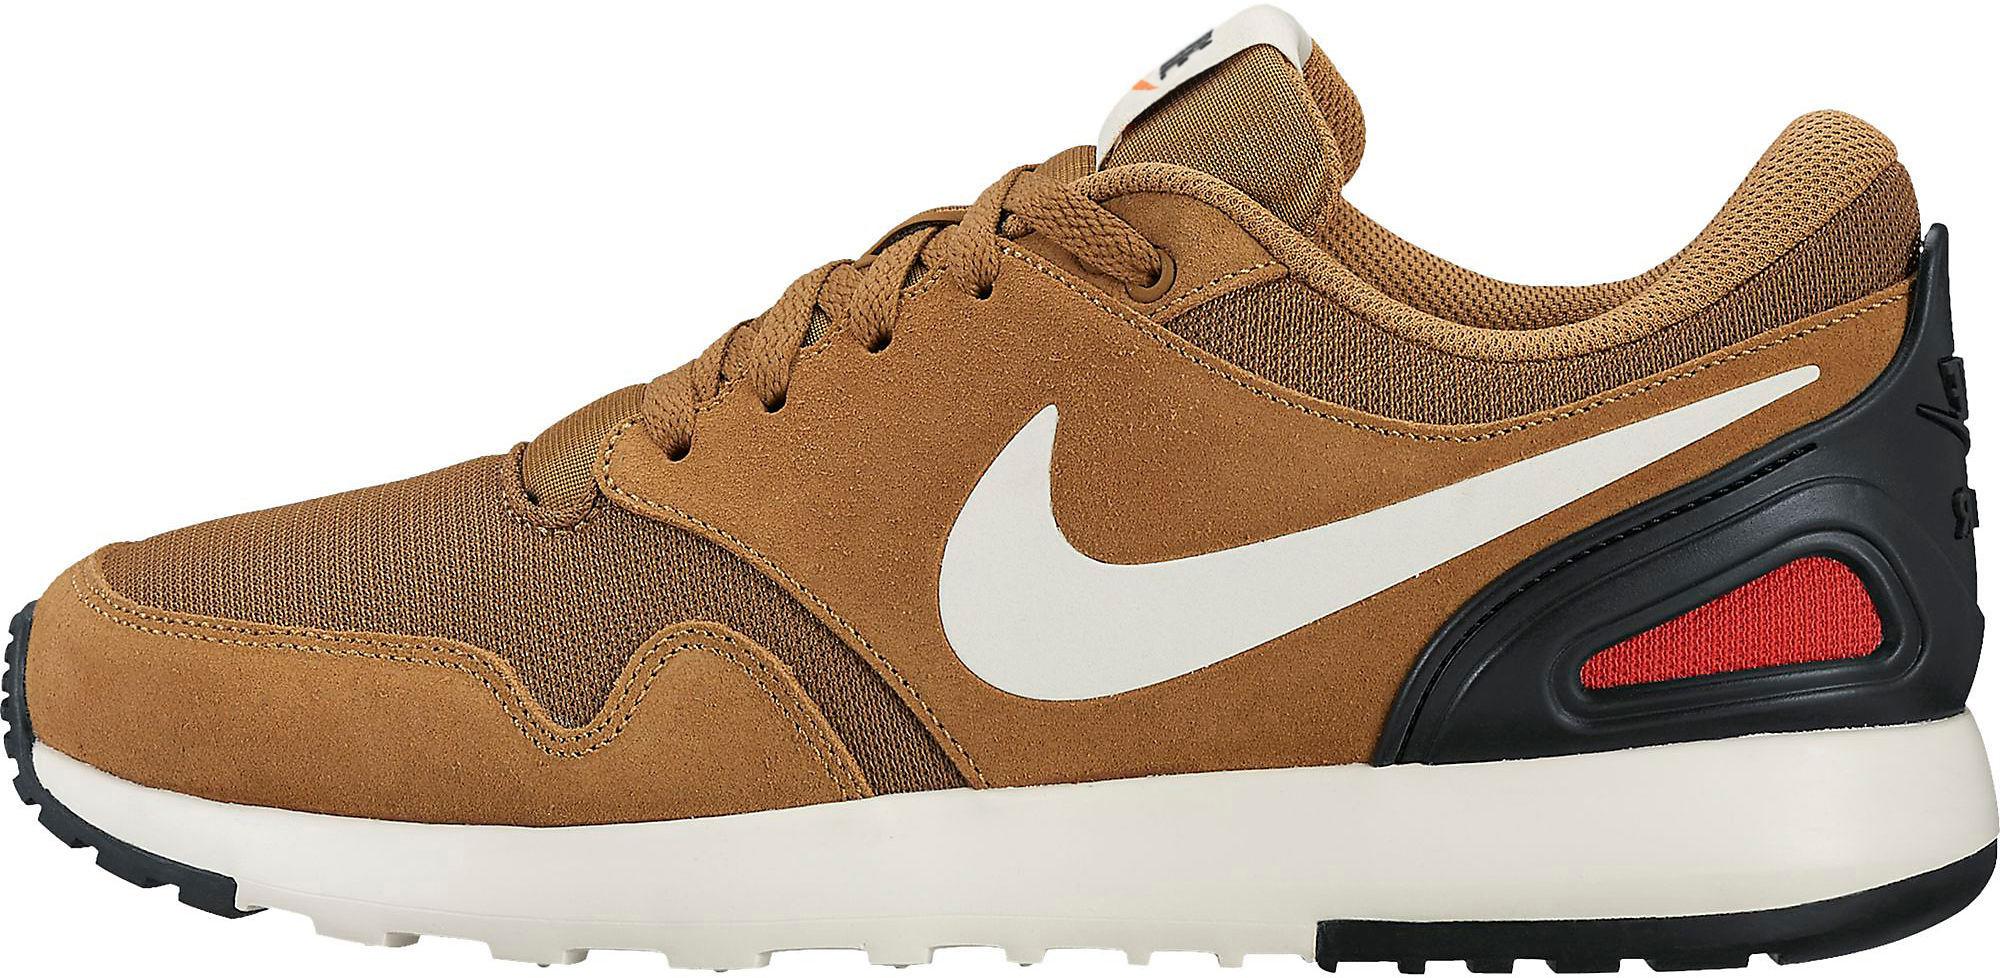 Nike Air Vibenna Sneaker / Trainingsschuhe (aboutyou.de) für 44,96€